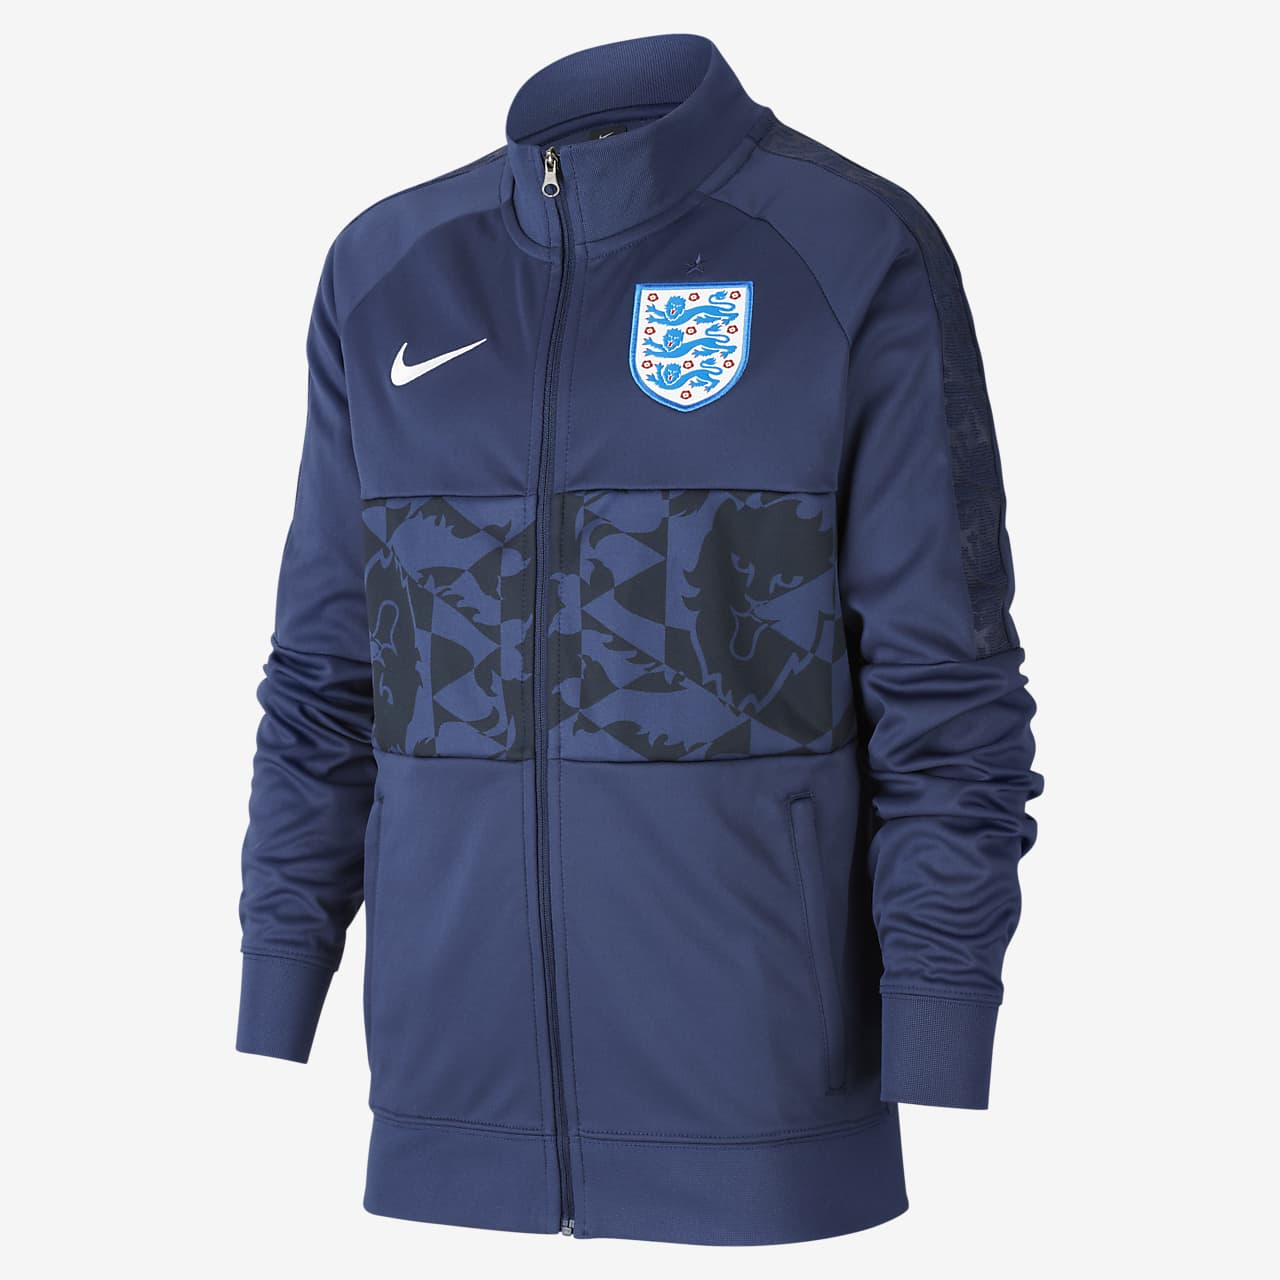 Giacca da calcio Inghilterra - Ragazzi